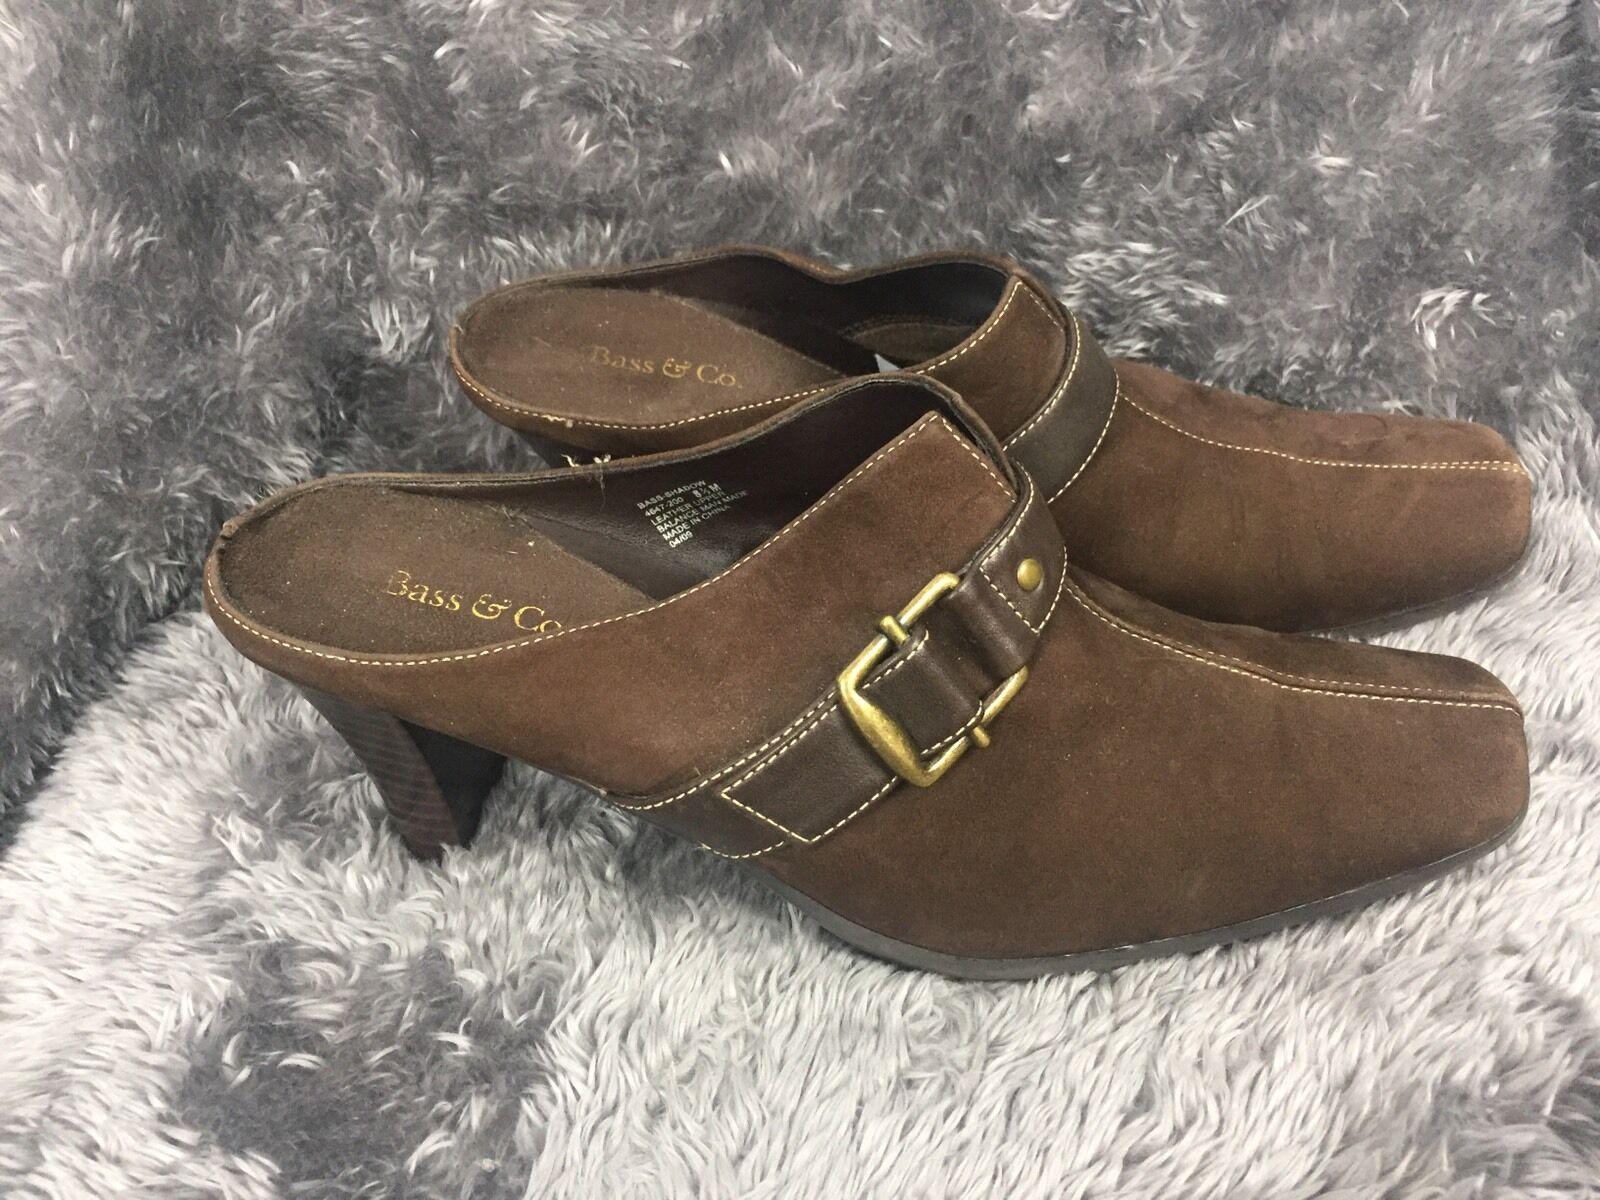 Bass Size 8.5 Clog Mule Brown Suede Heel Shoe On Square Toe Buckle Slip On Shoe Women's 8c3d36